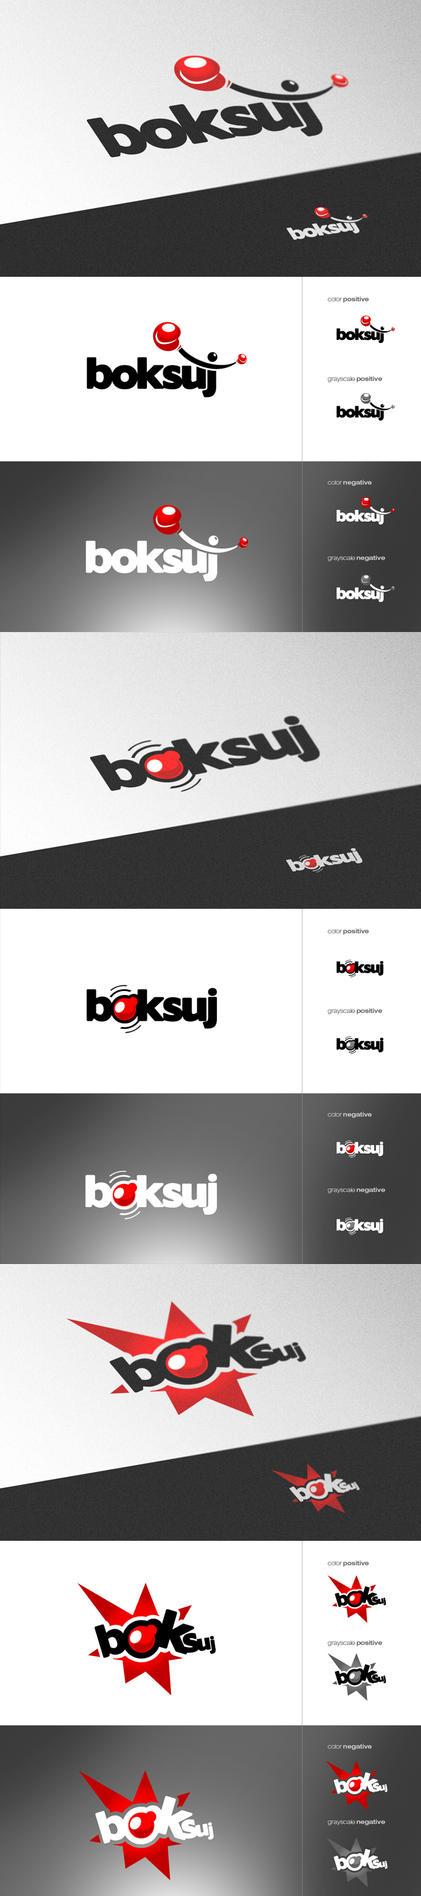 boksuj.pl logotype by pho3nix-bf